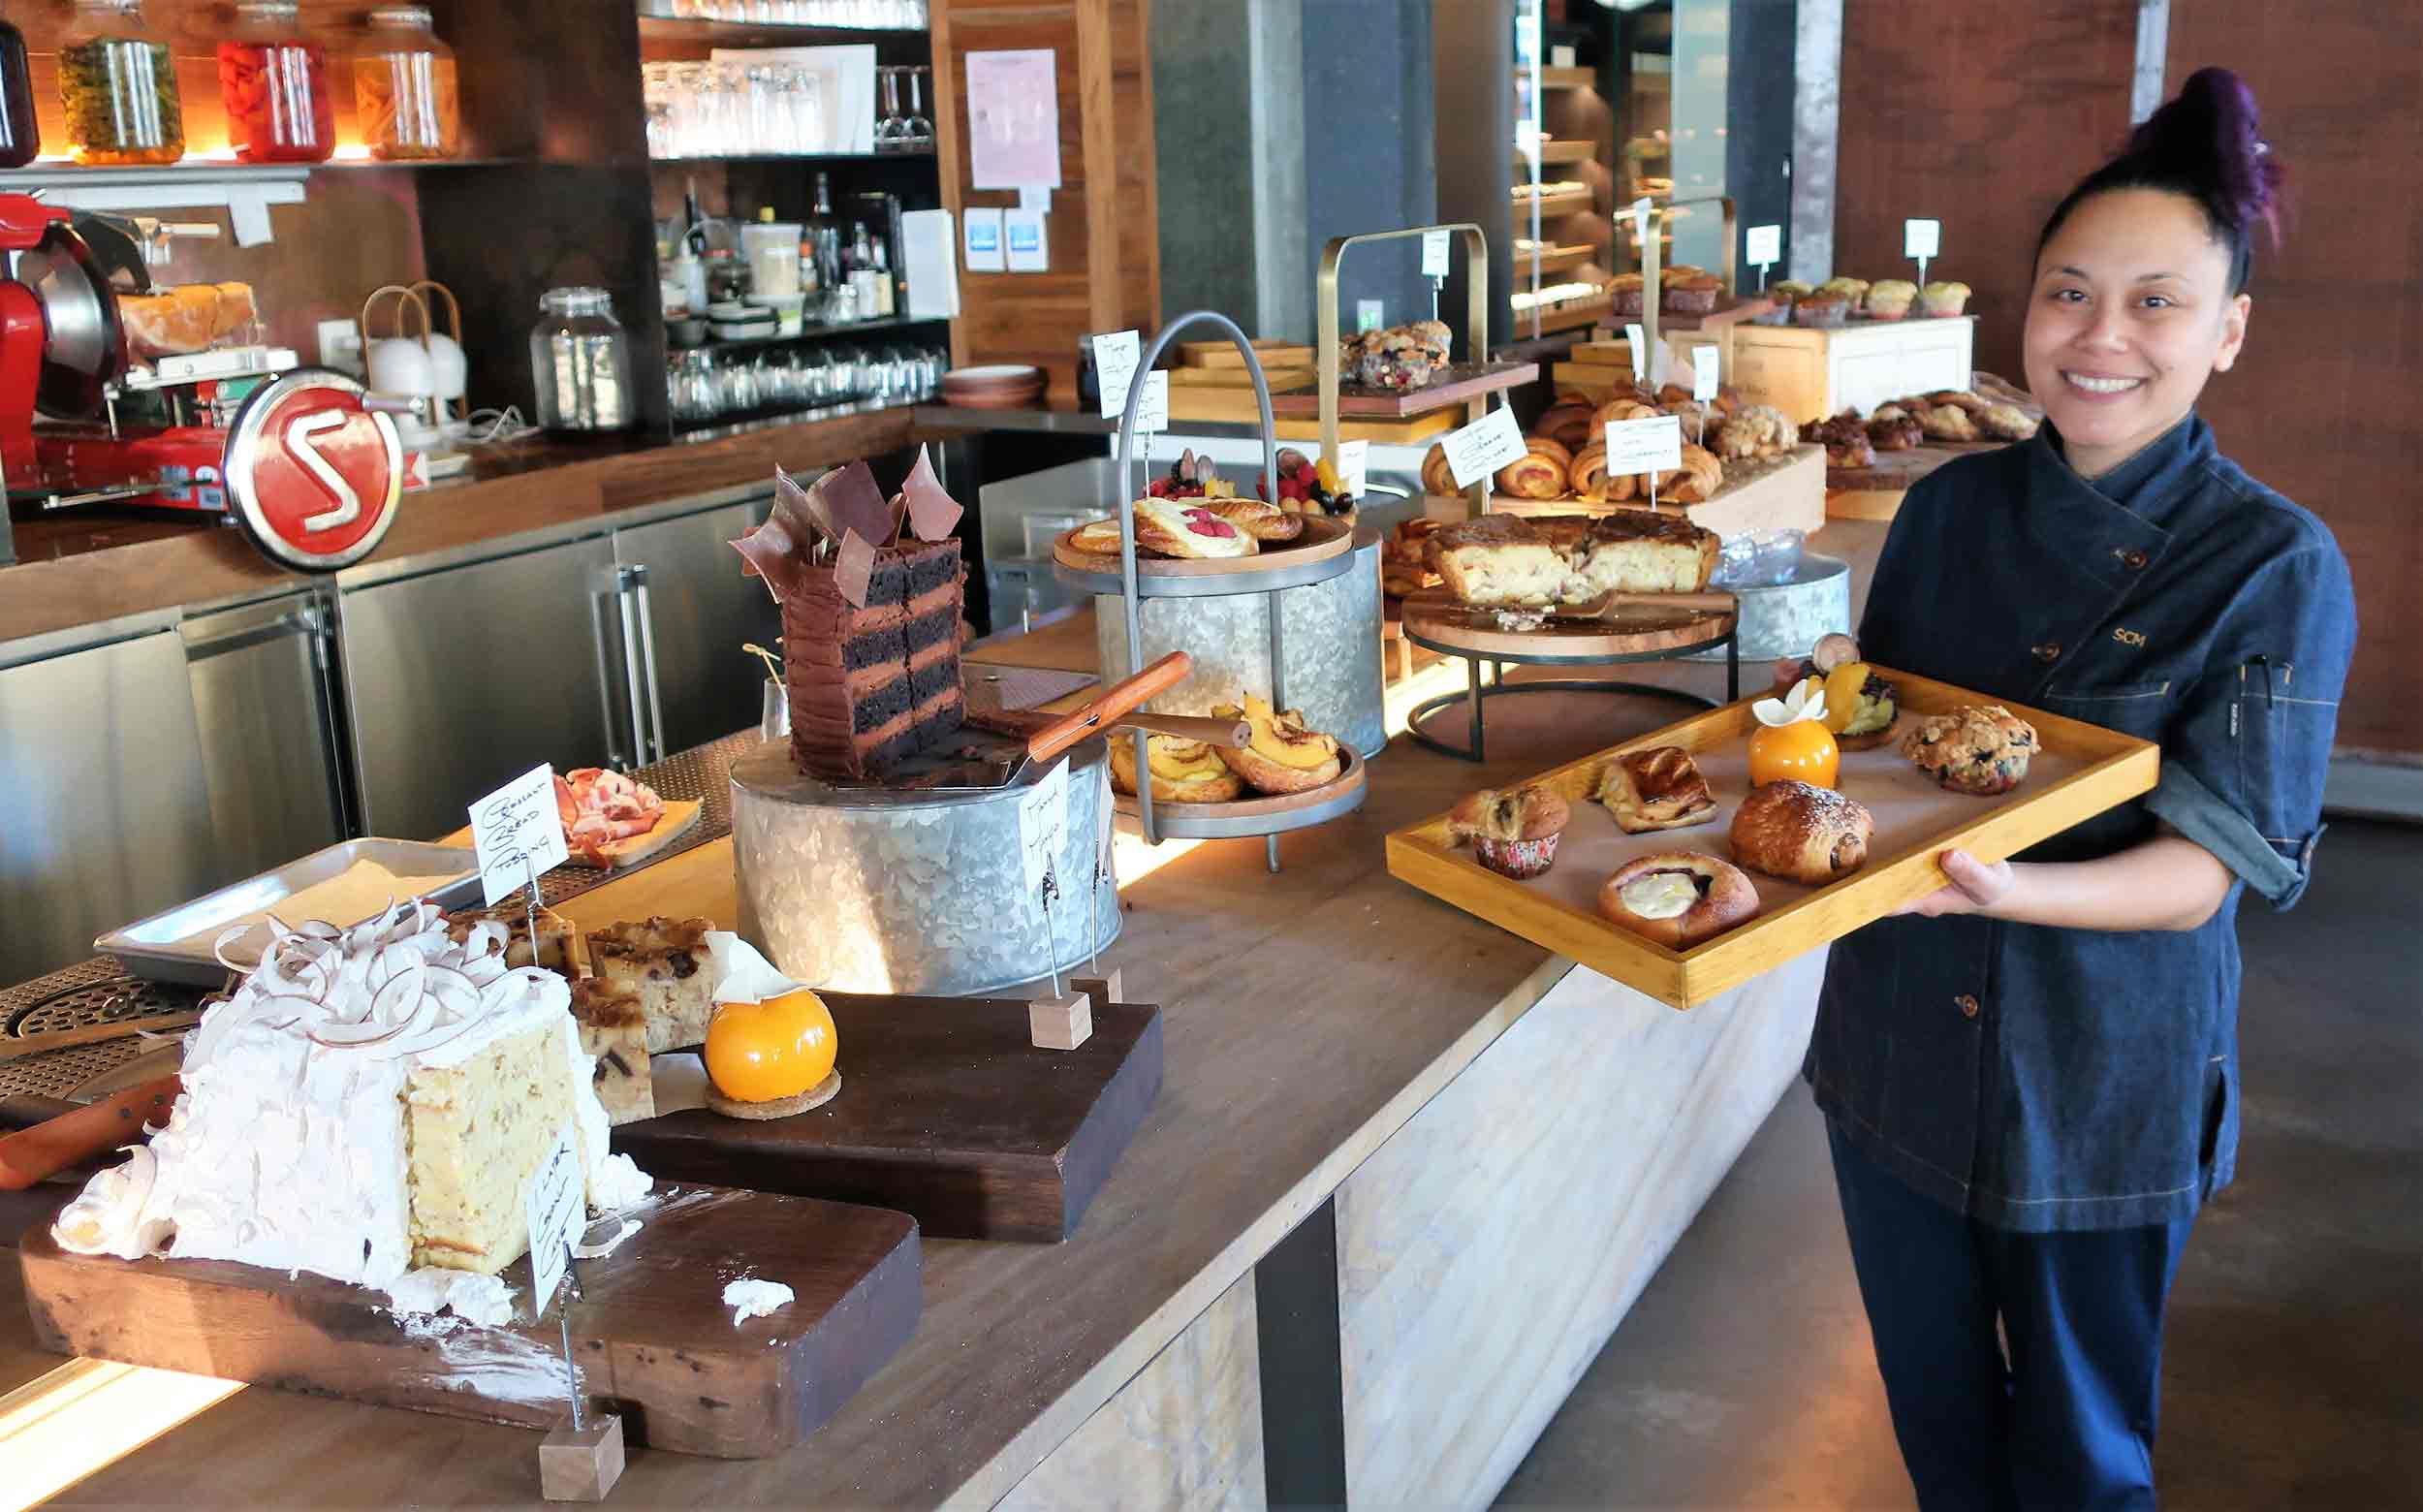 Pastry chef Sally Camacho Mueller